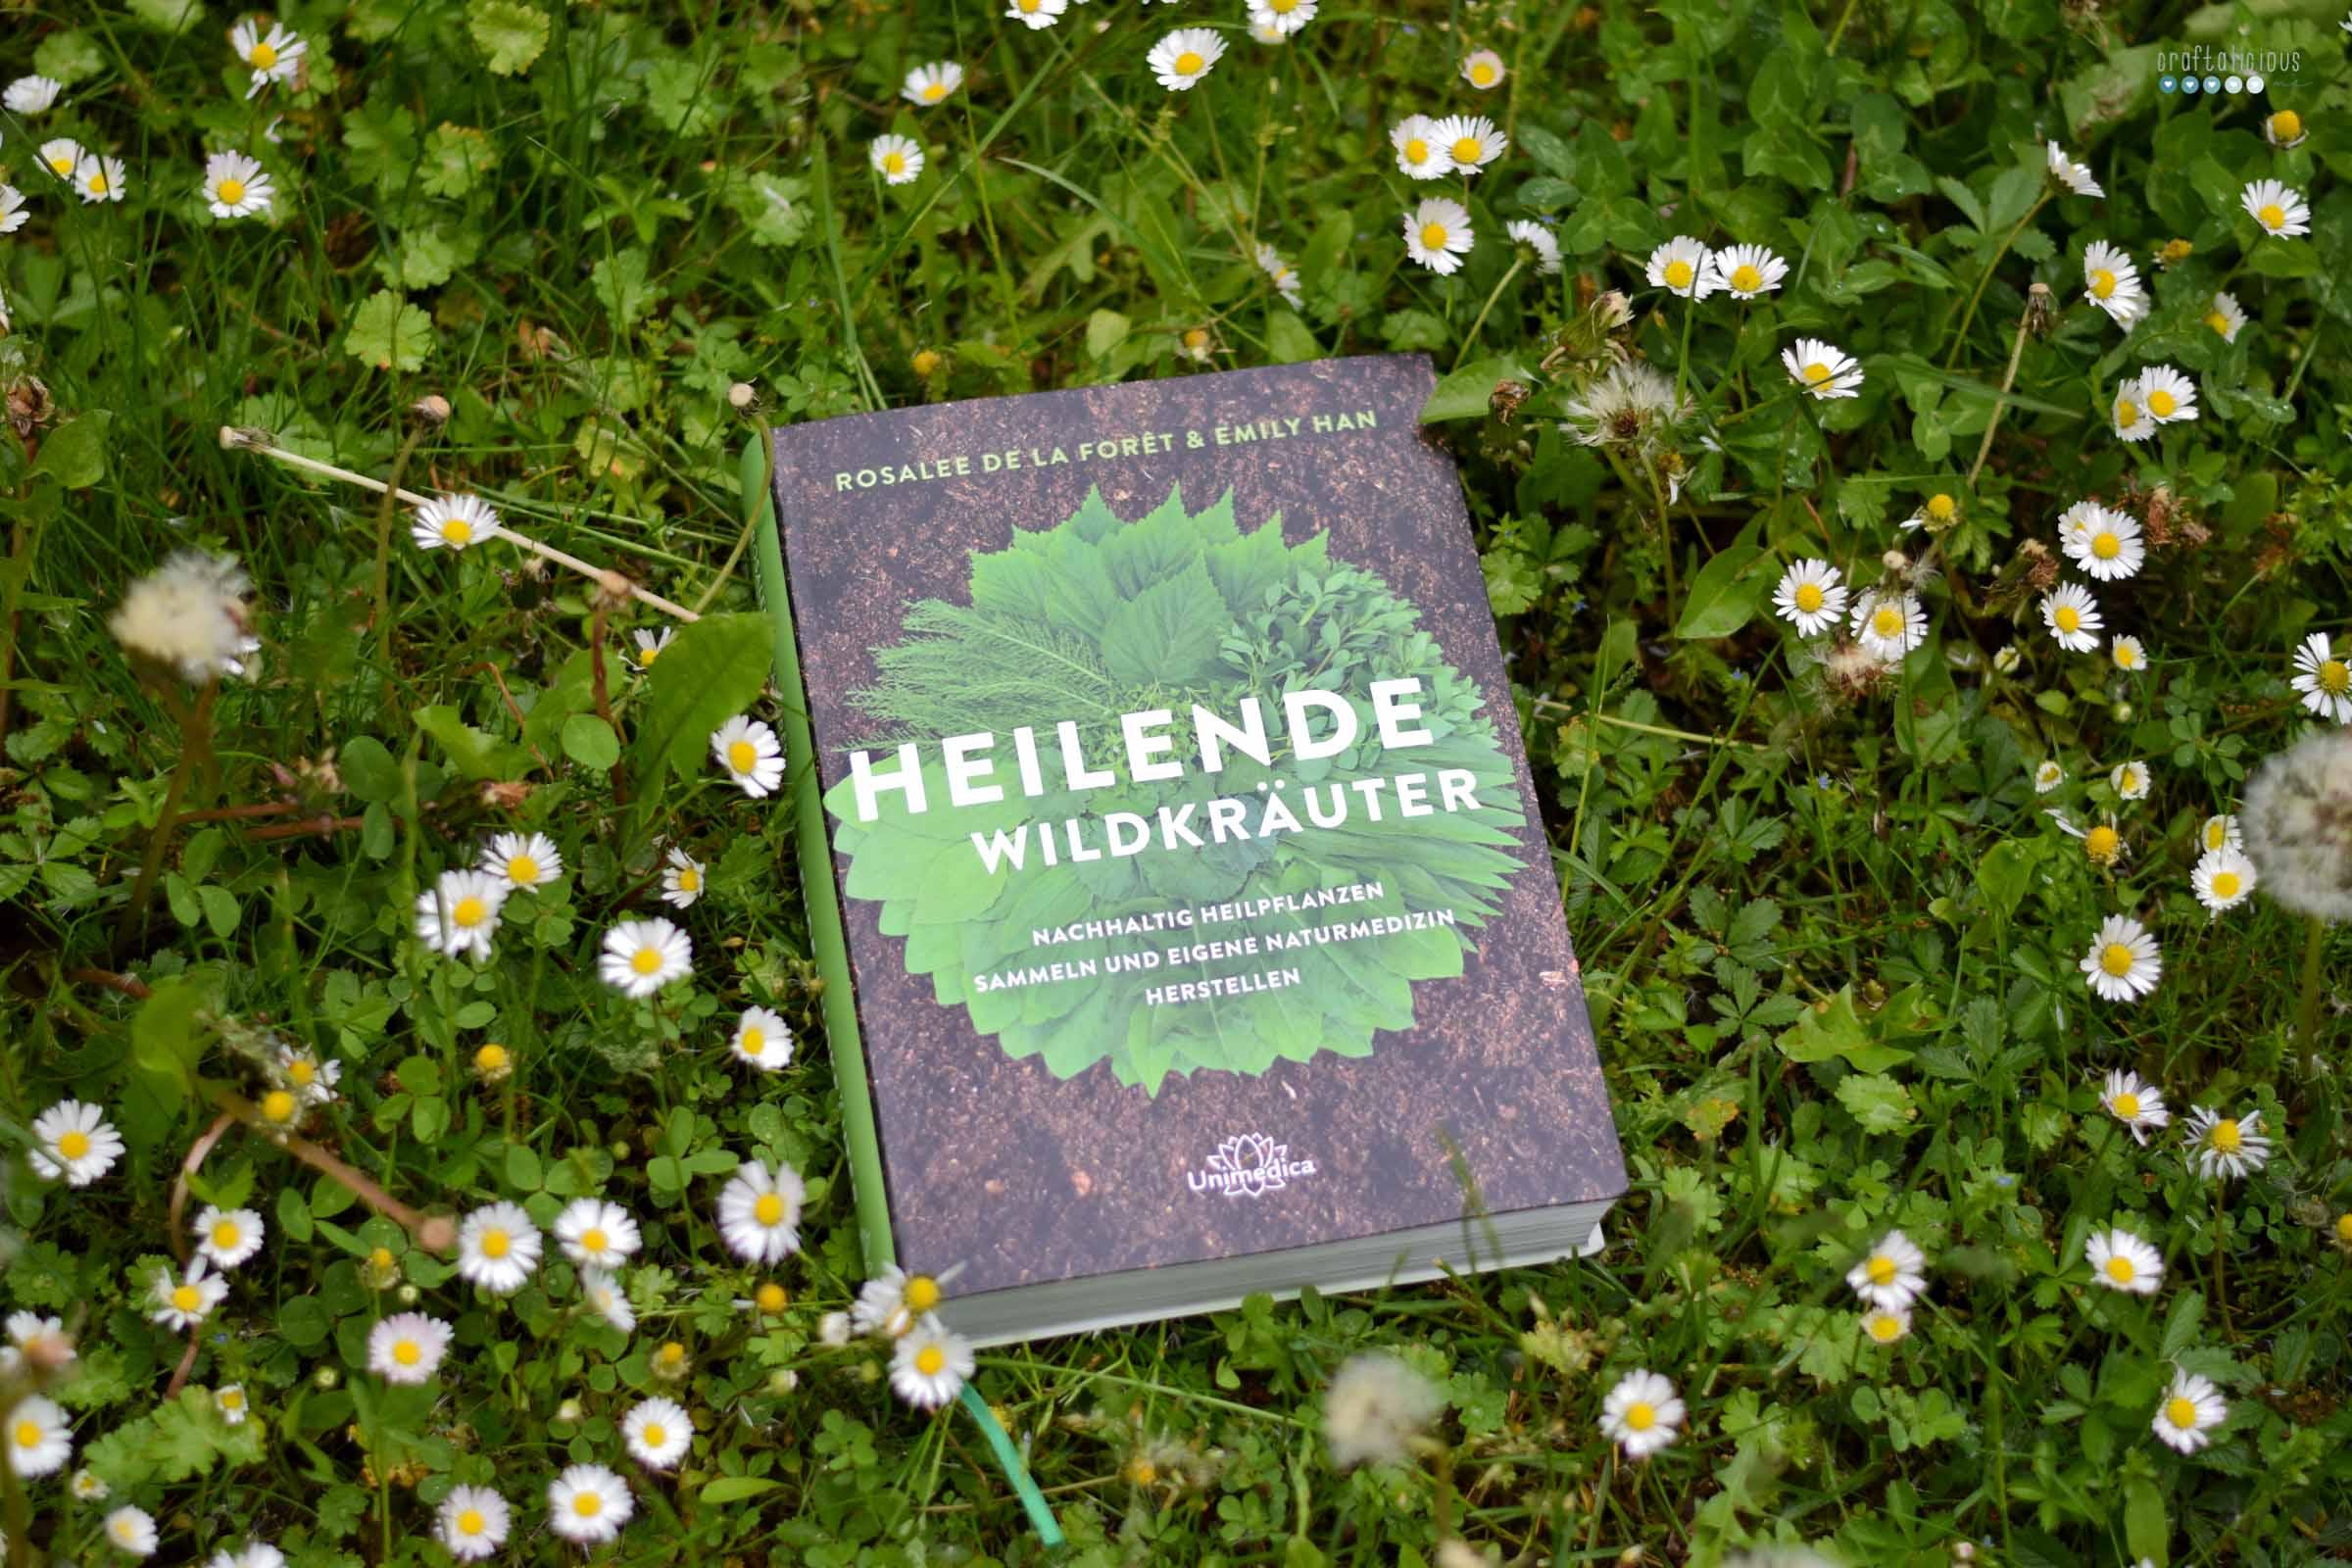 Gathering herbs and wild remedies cover Heilende Wildkräuter Rosalee de la Foret Emily Han